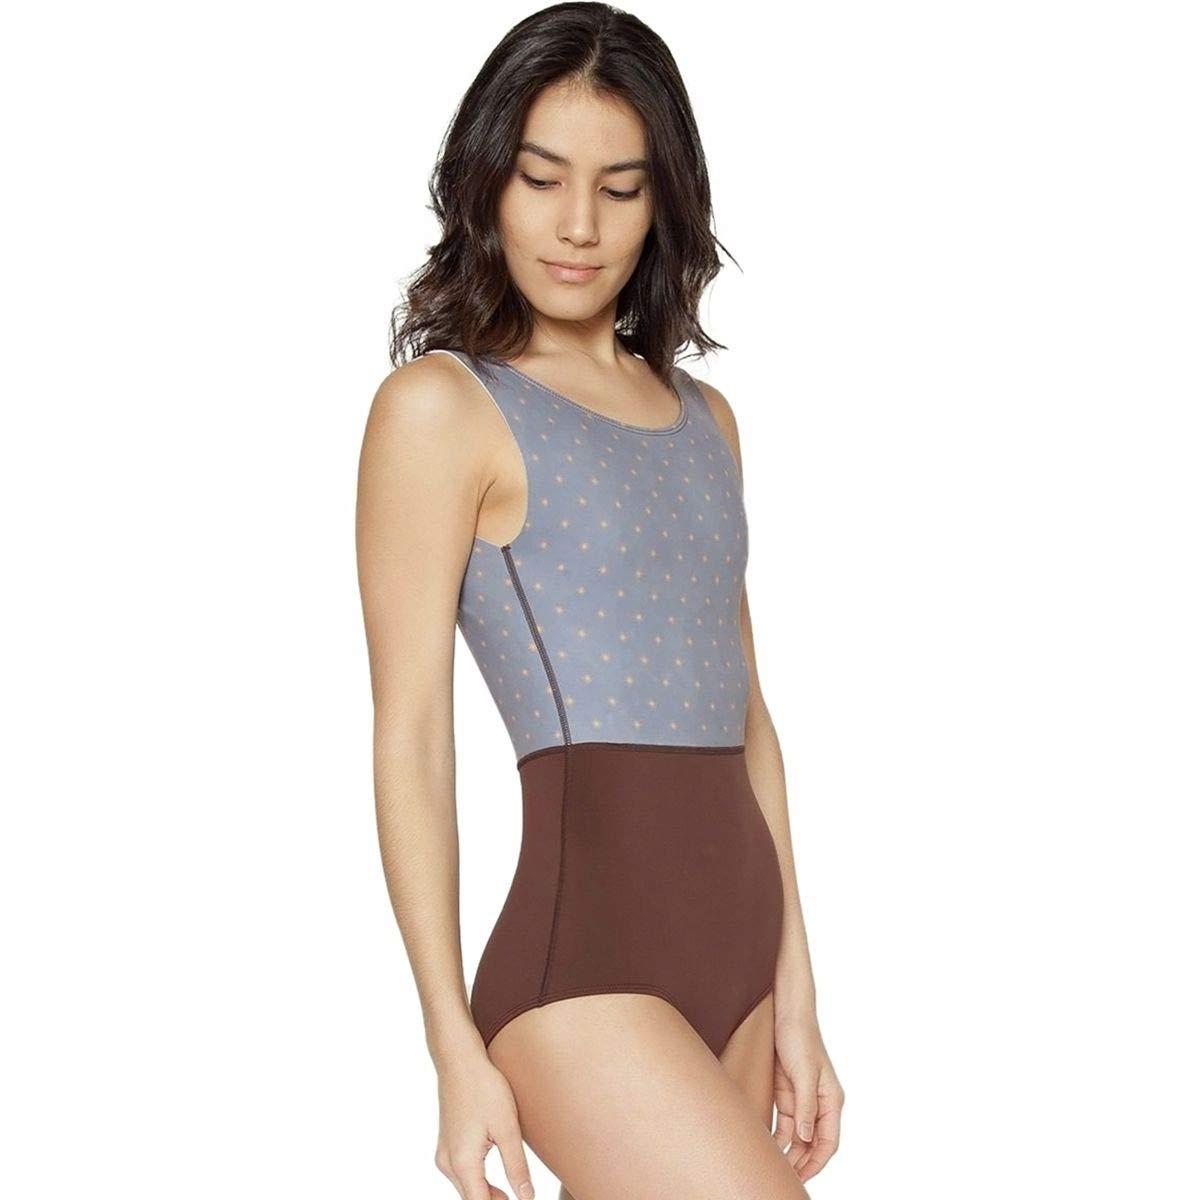 936be841342f2 Seea Women's Lido Swimsuit at Amazon Women's Clothing store: